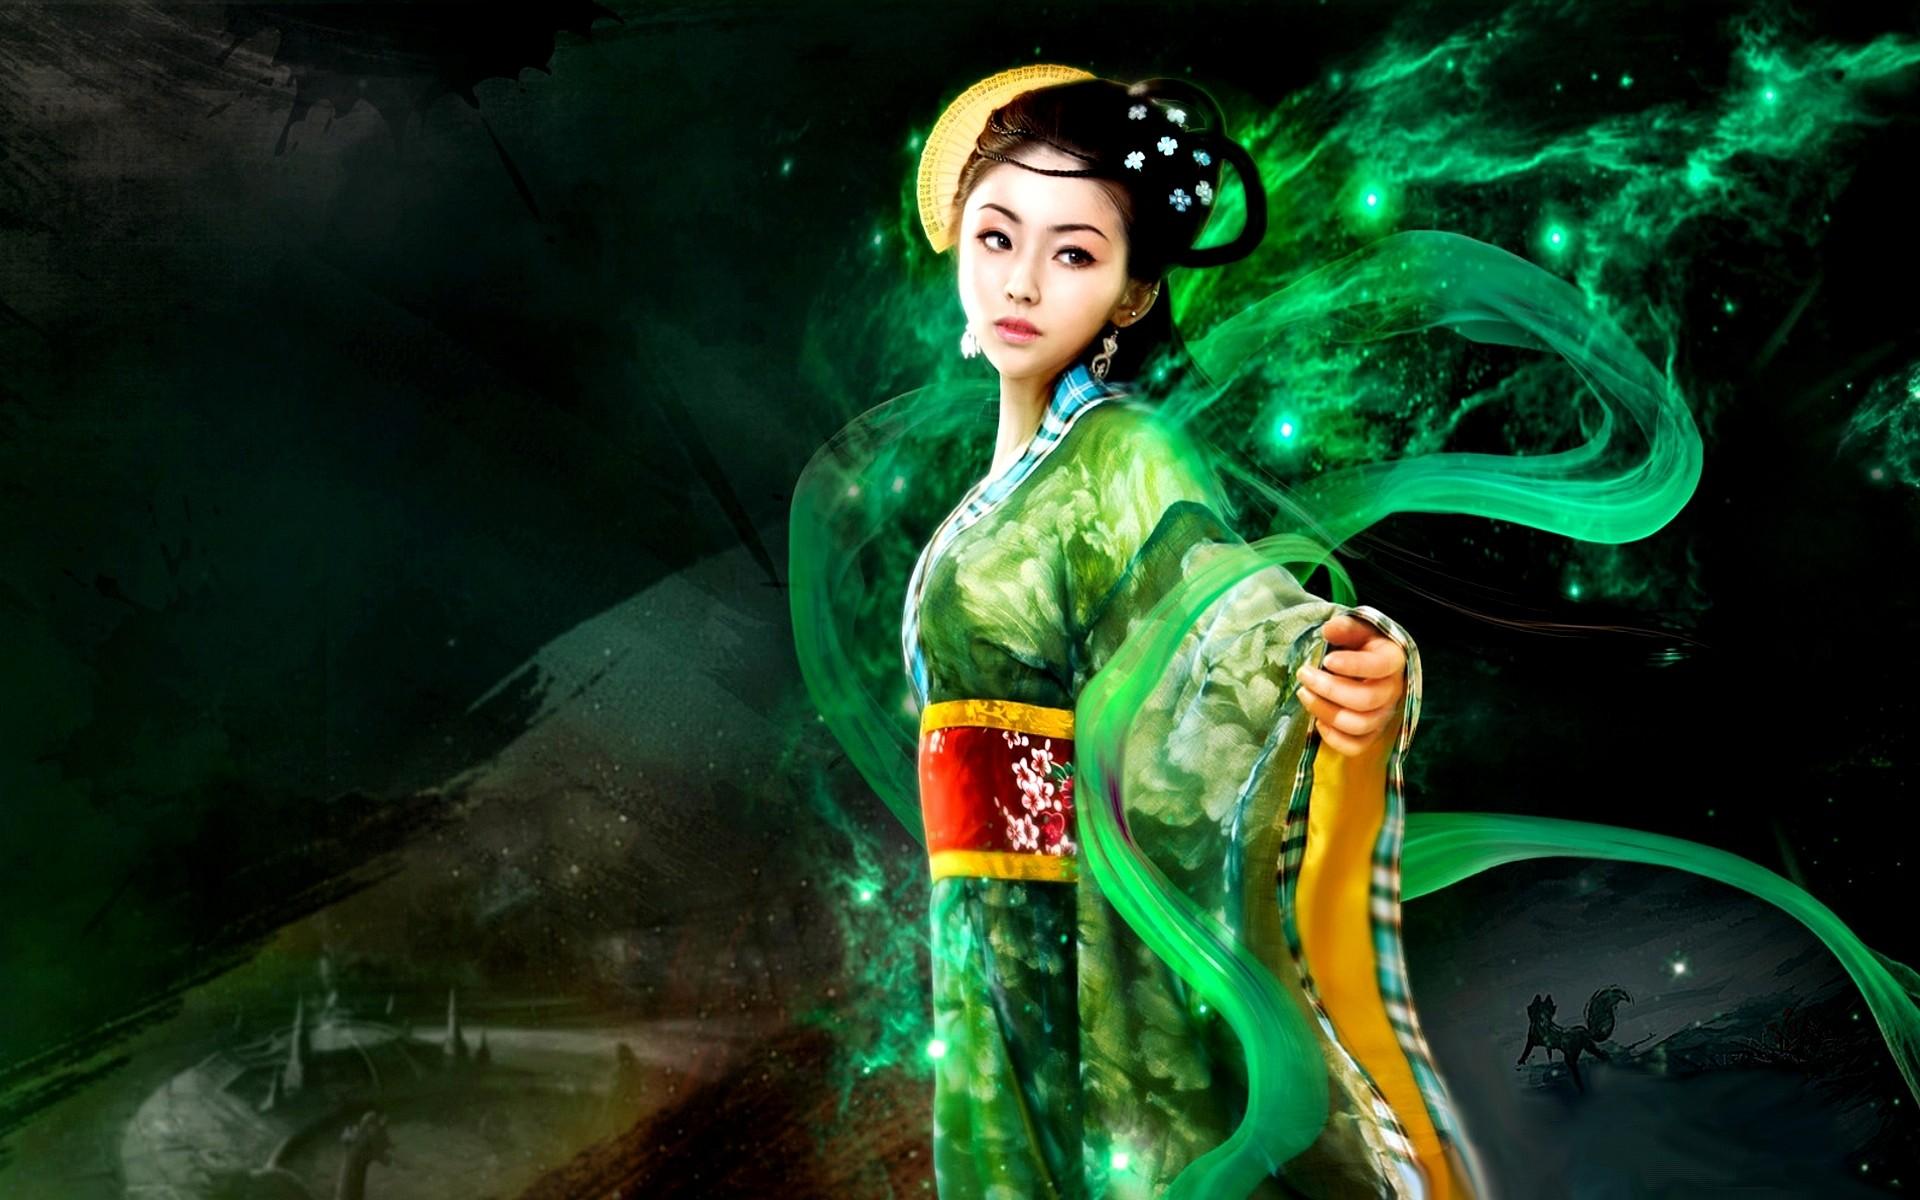 Disney Princess Hd Wallpaper Free Download × Disney Princess